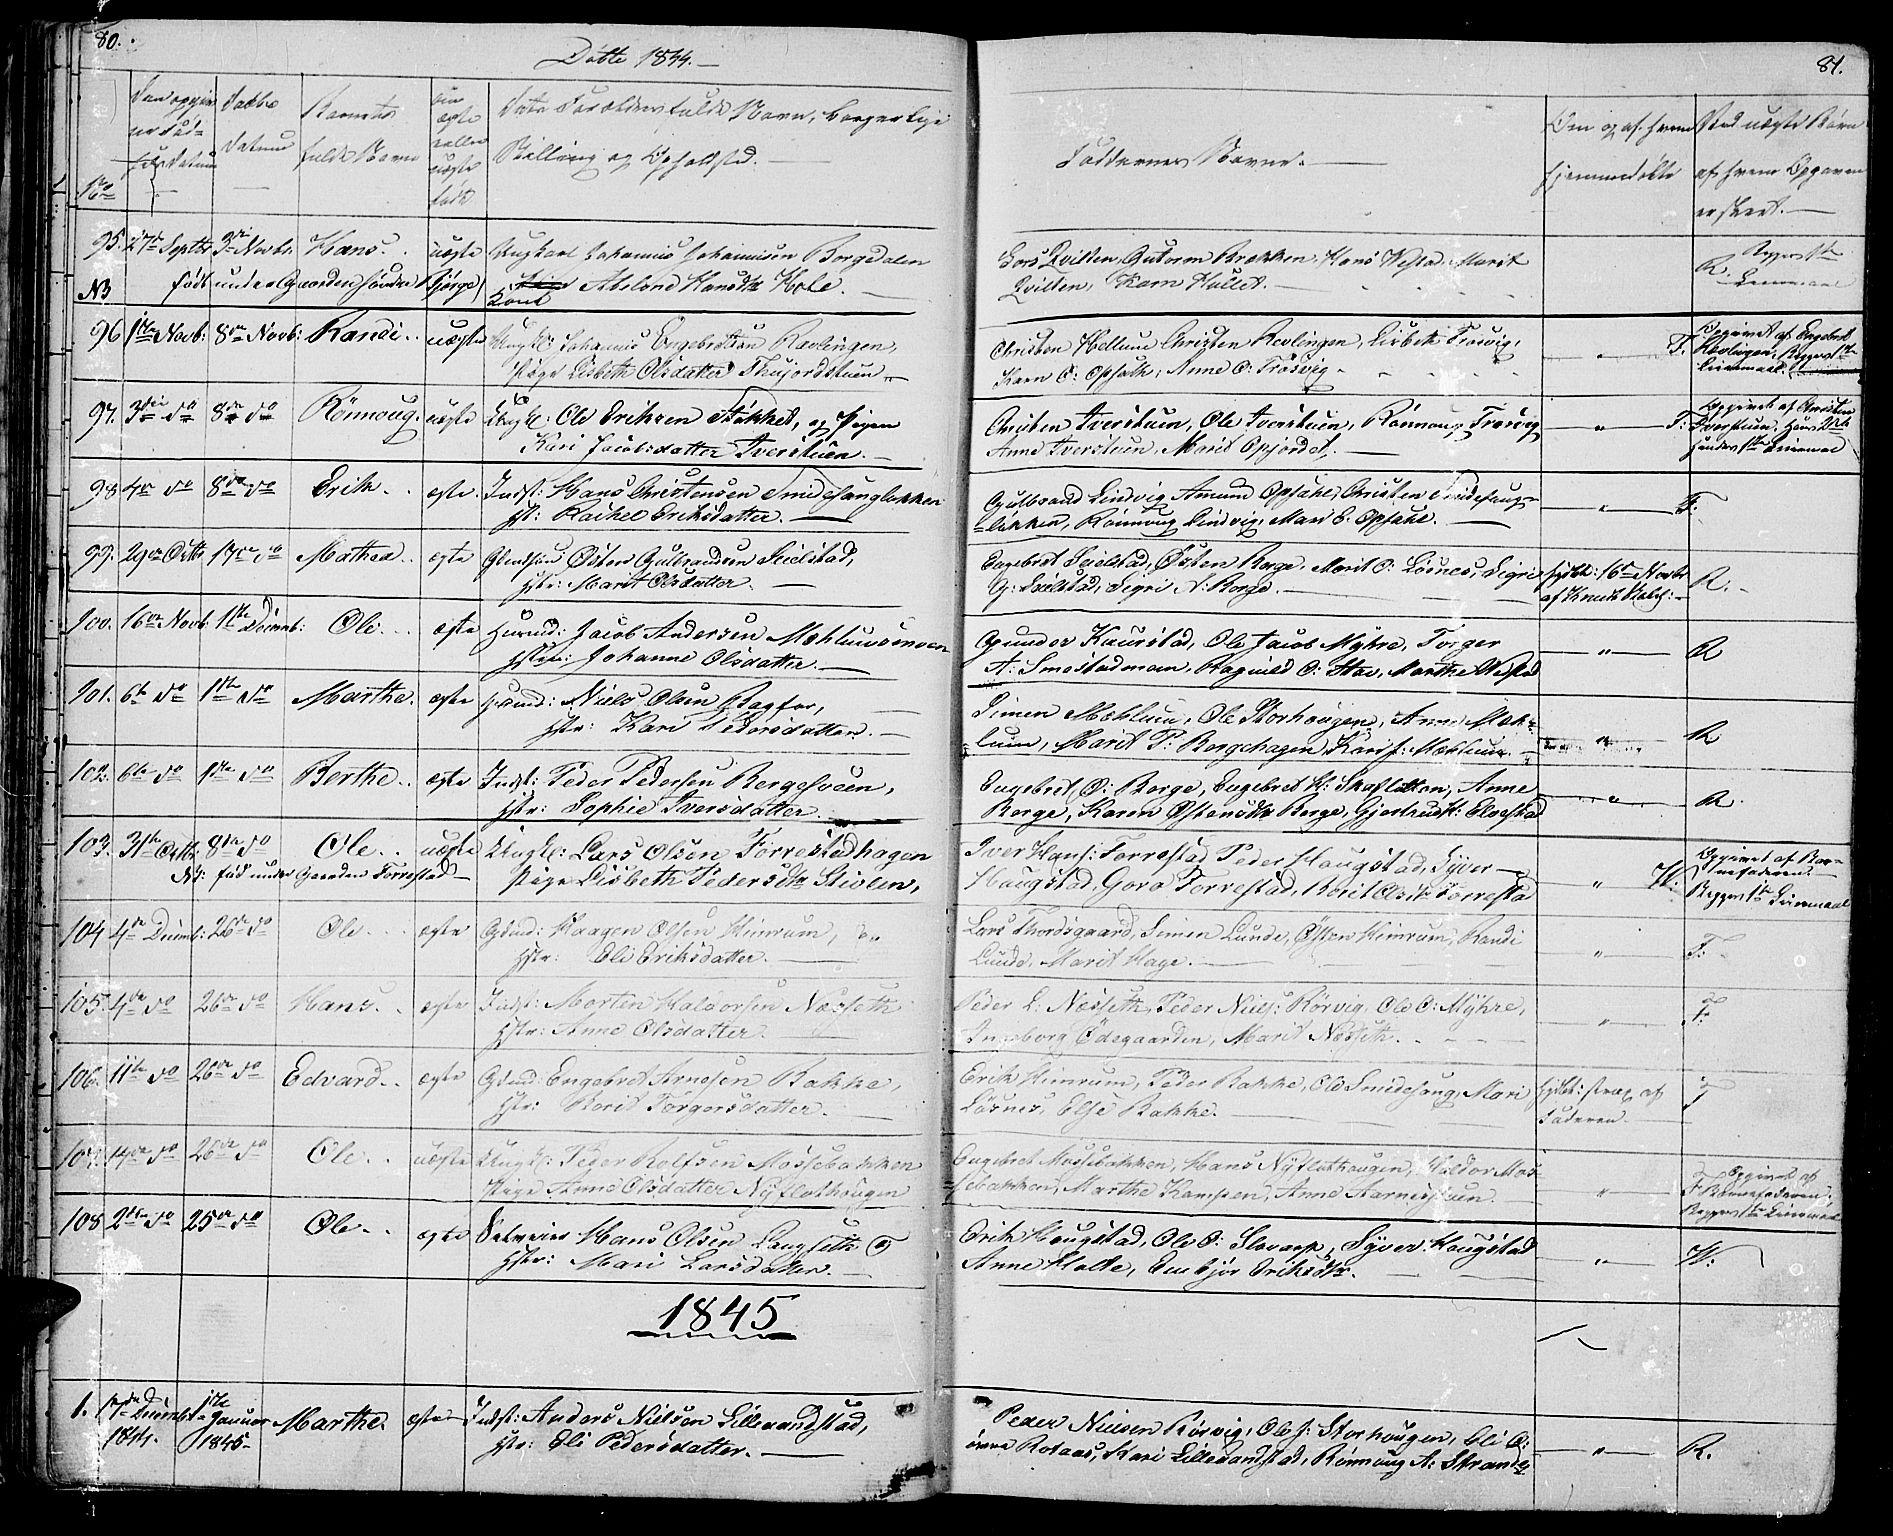 SAH, Ringebu prestekontor, Klokkerbok nr. 2, 1839-1853, s. 80-81